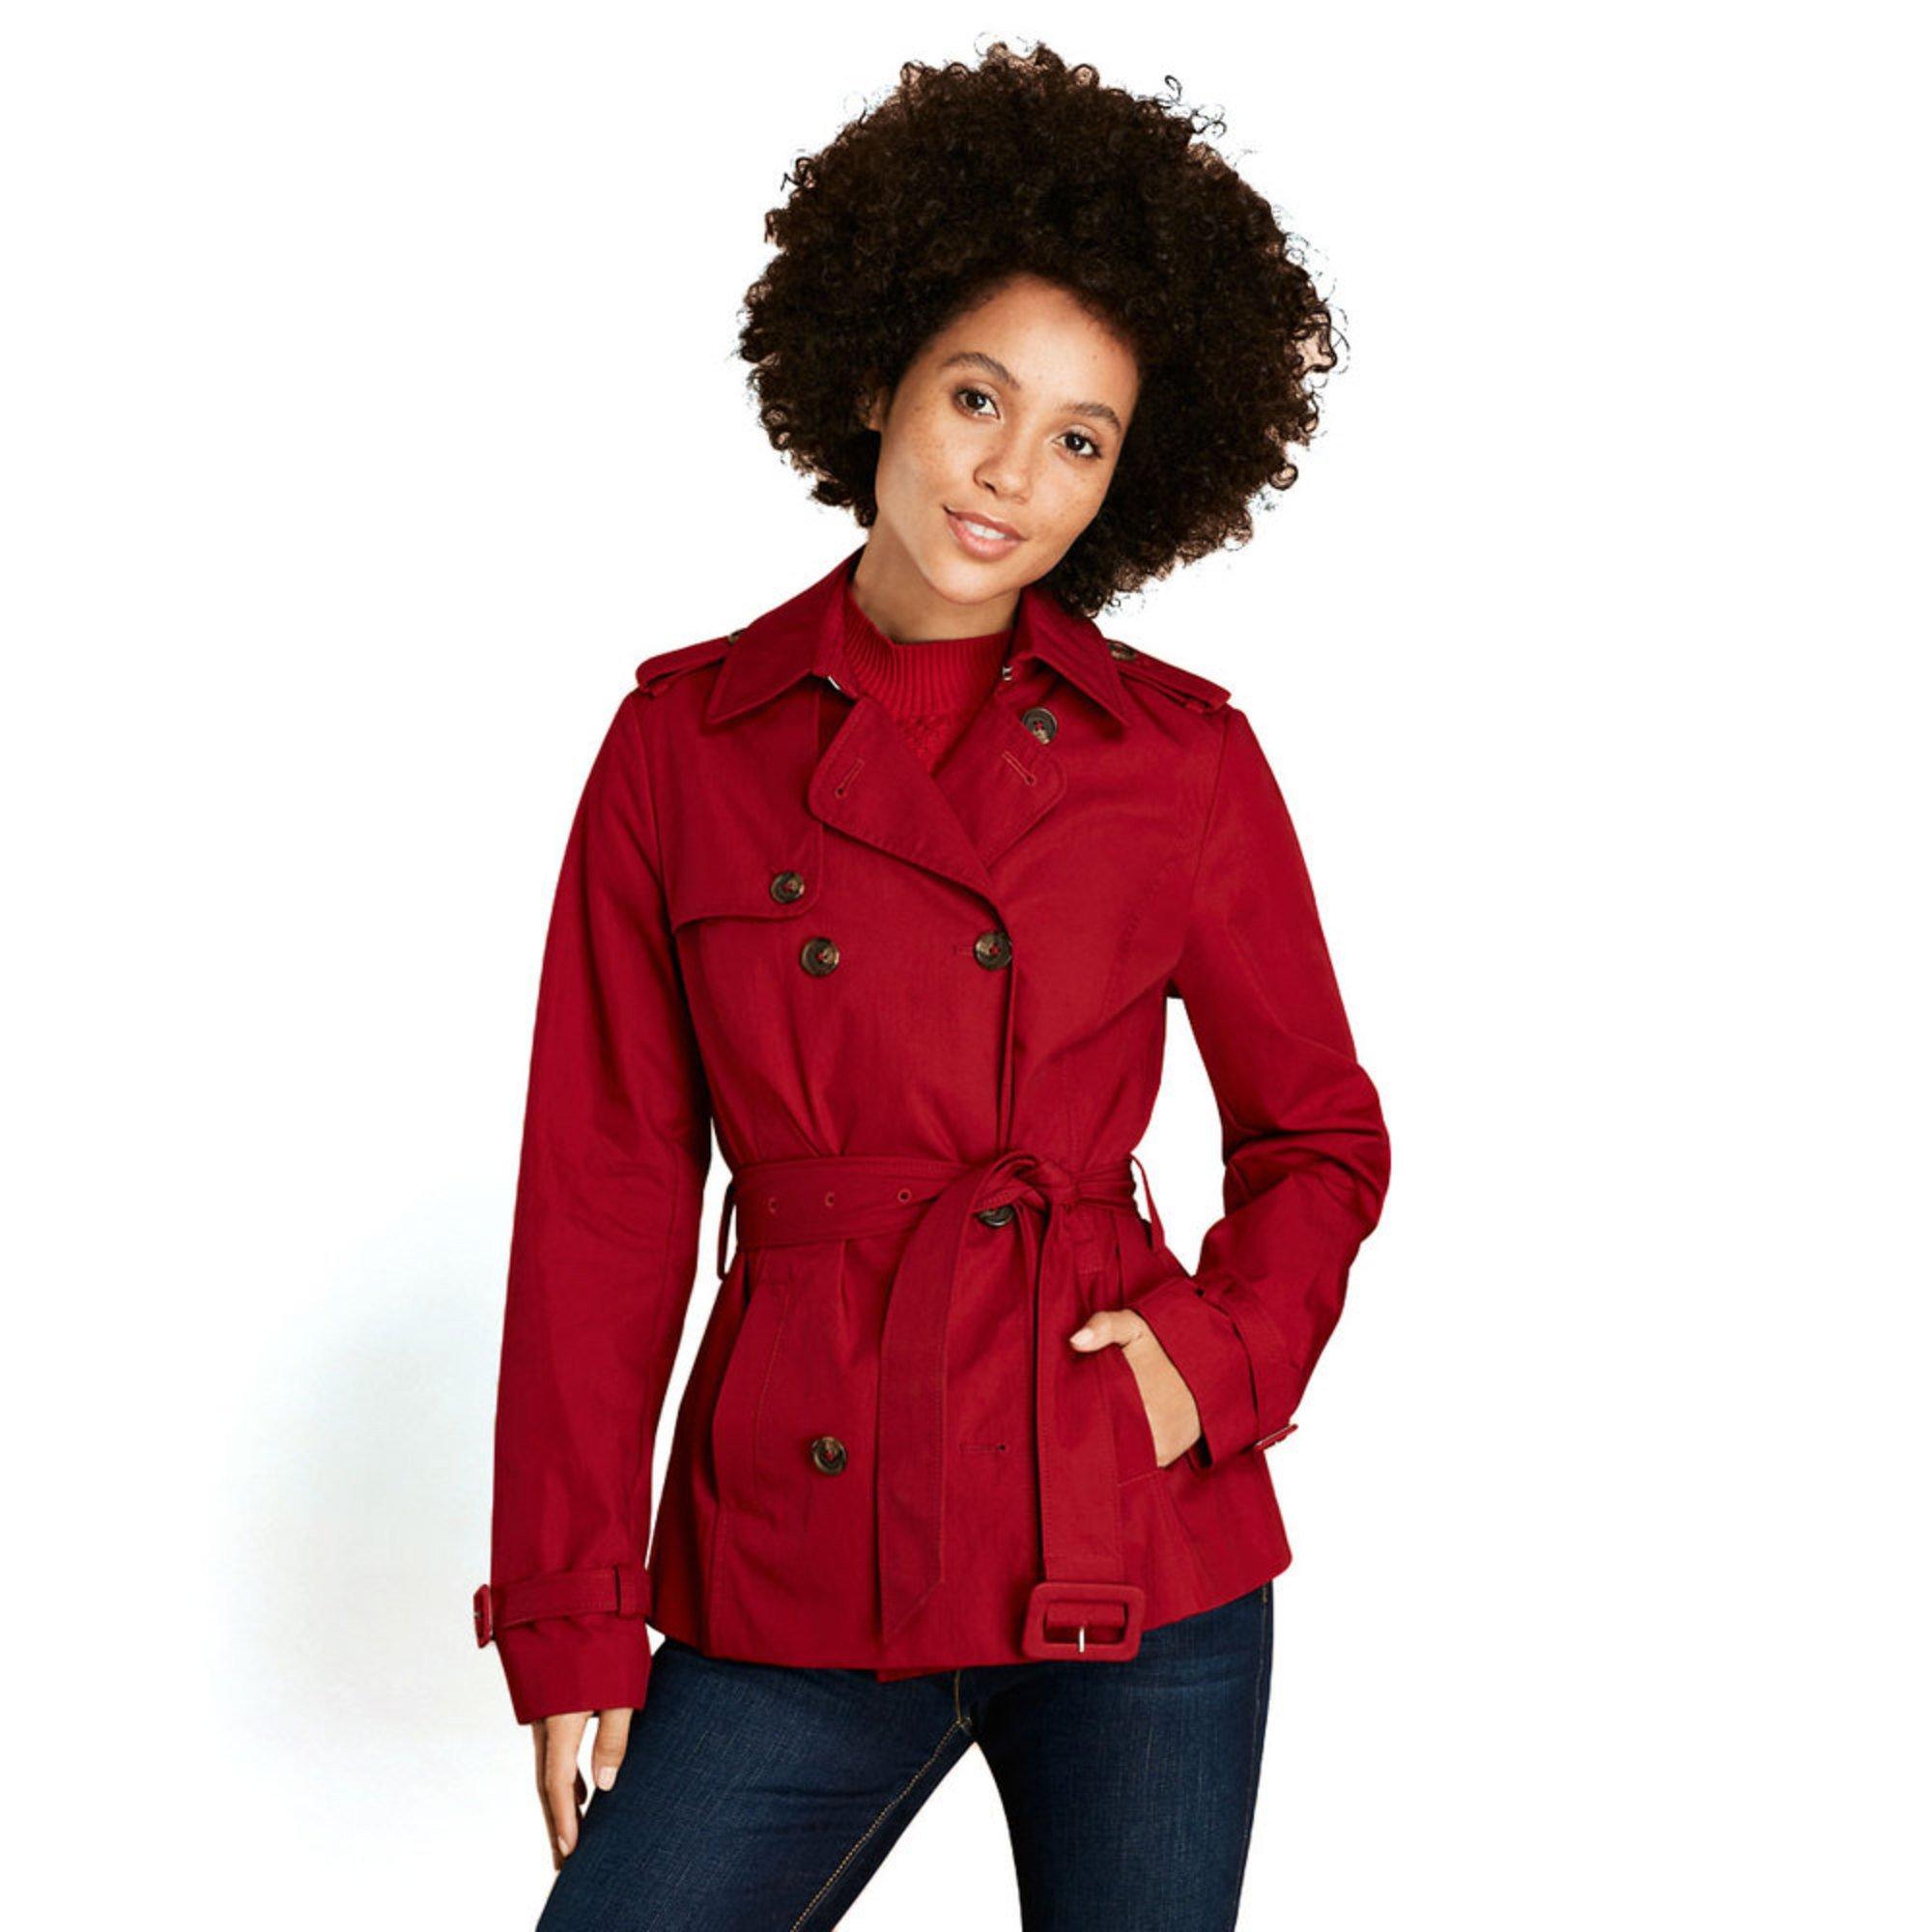 af9a4d92c Brooks Brothers Women's Red Fleece Short Belted Jacket   Casual ...